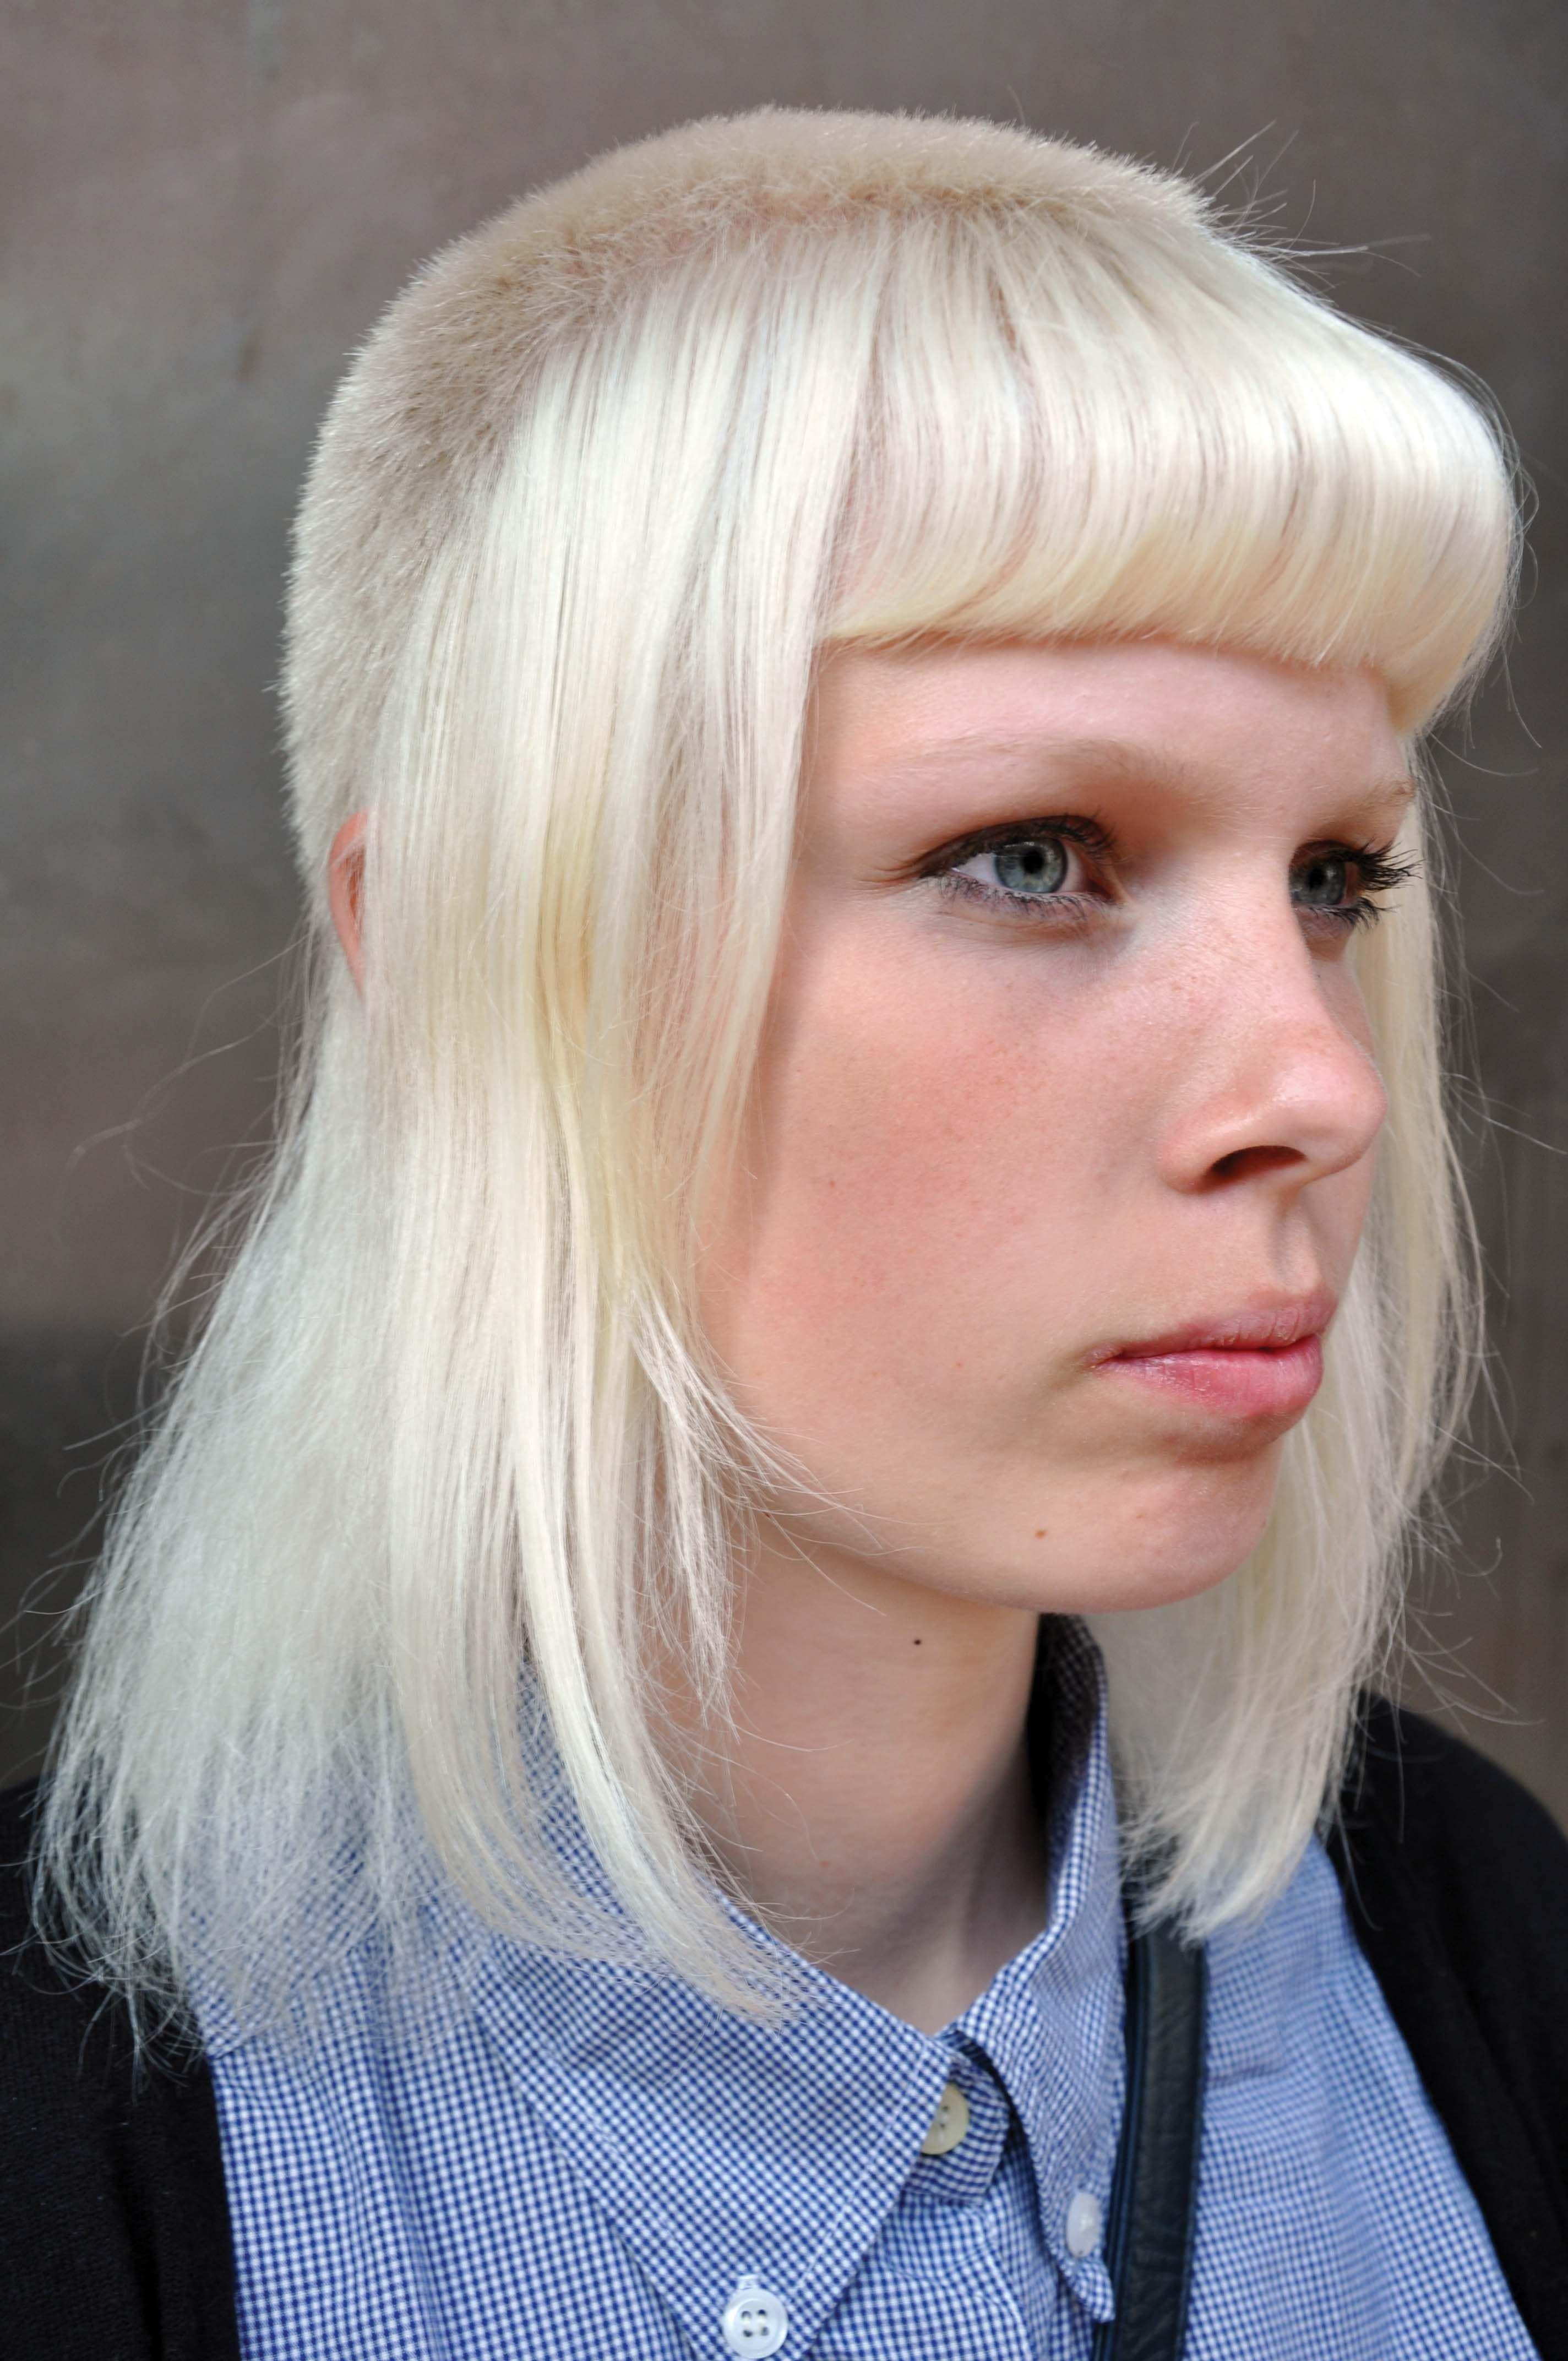 Swedish Skinhead girl